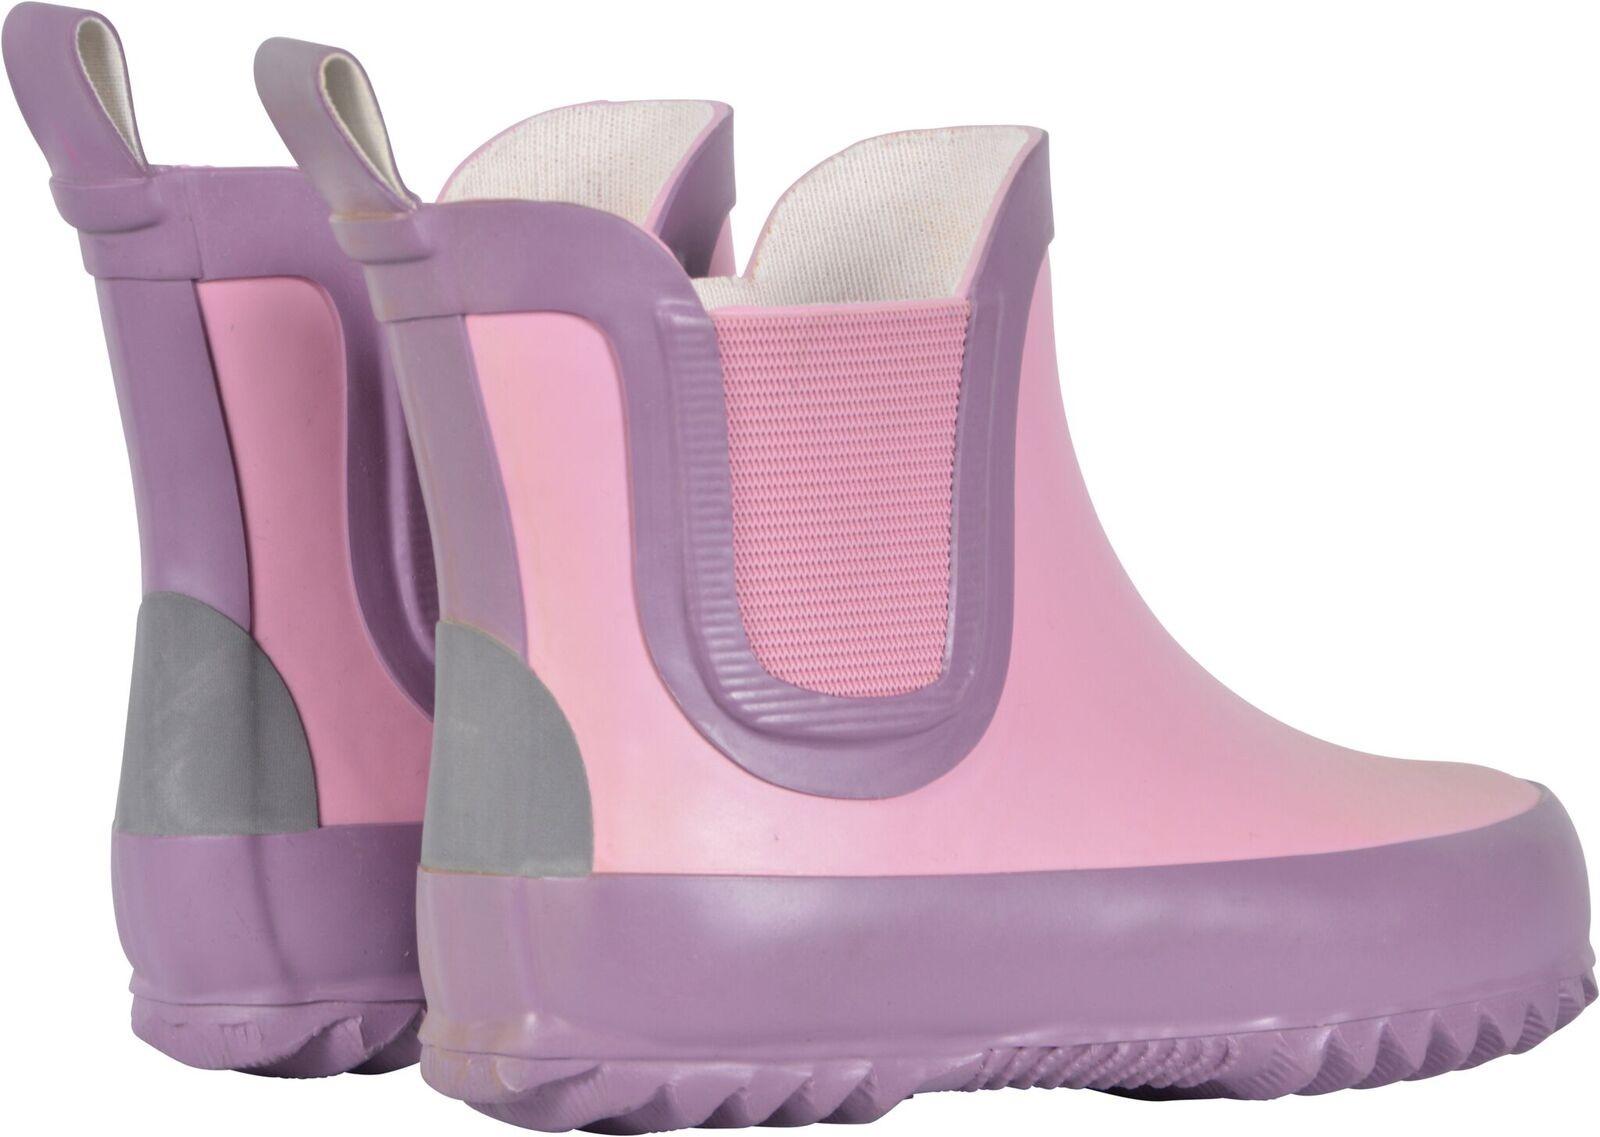 9f67791b66f Mikk-line gummistøvle kort skaft lyserød - Reste-pus